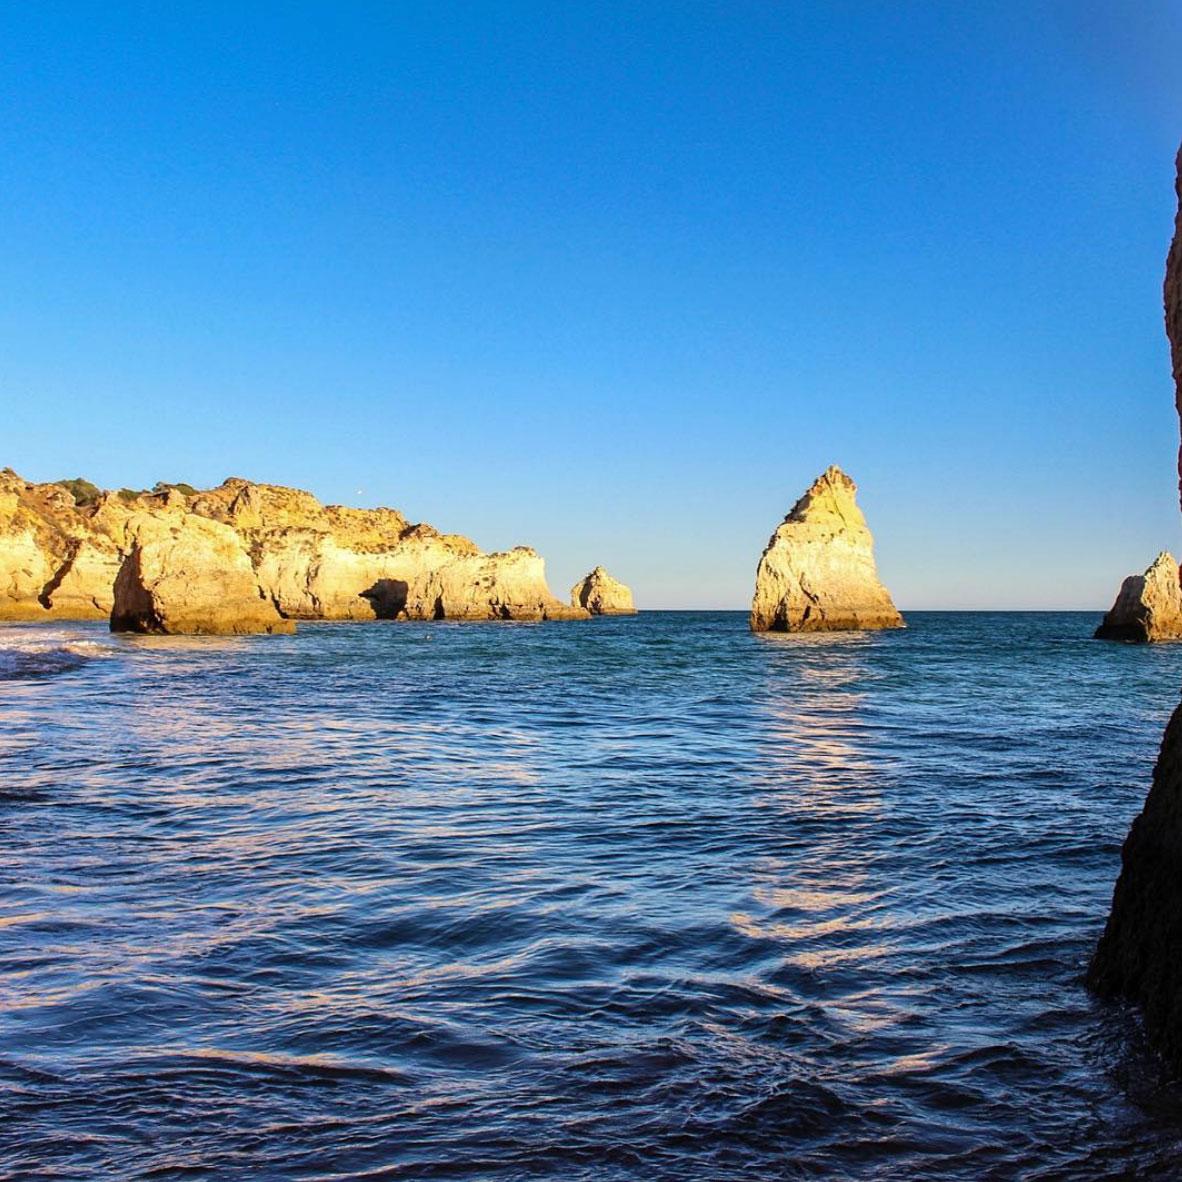 Beautiful sunset in Algarve, Portugal